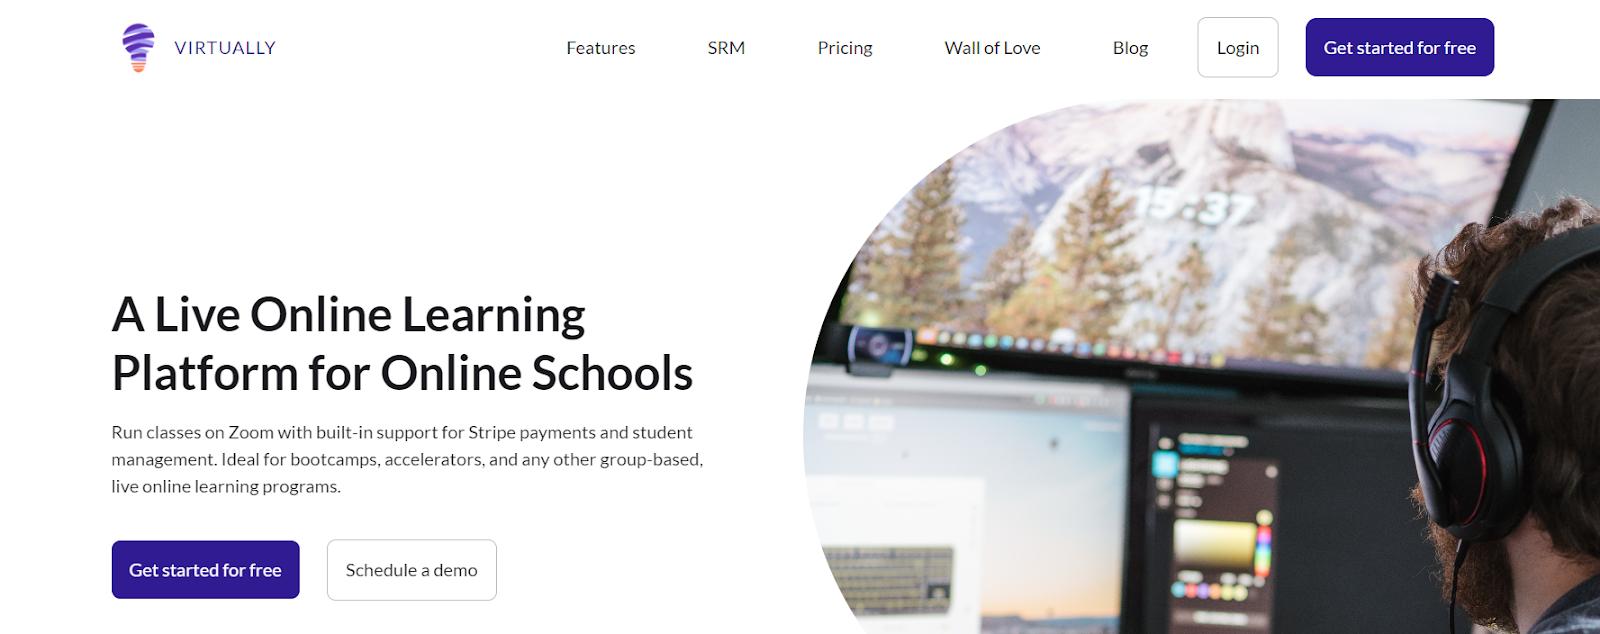 Screenshot of Virtually - Cohort Based Course Platform